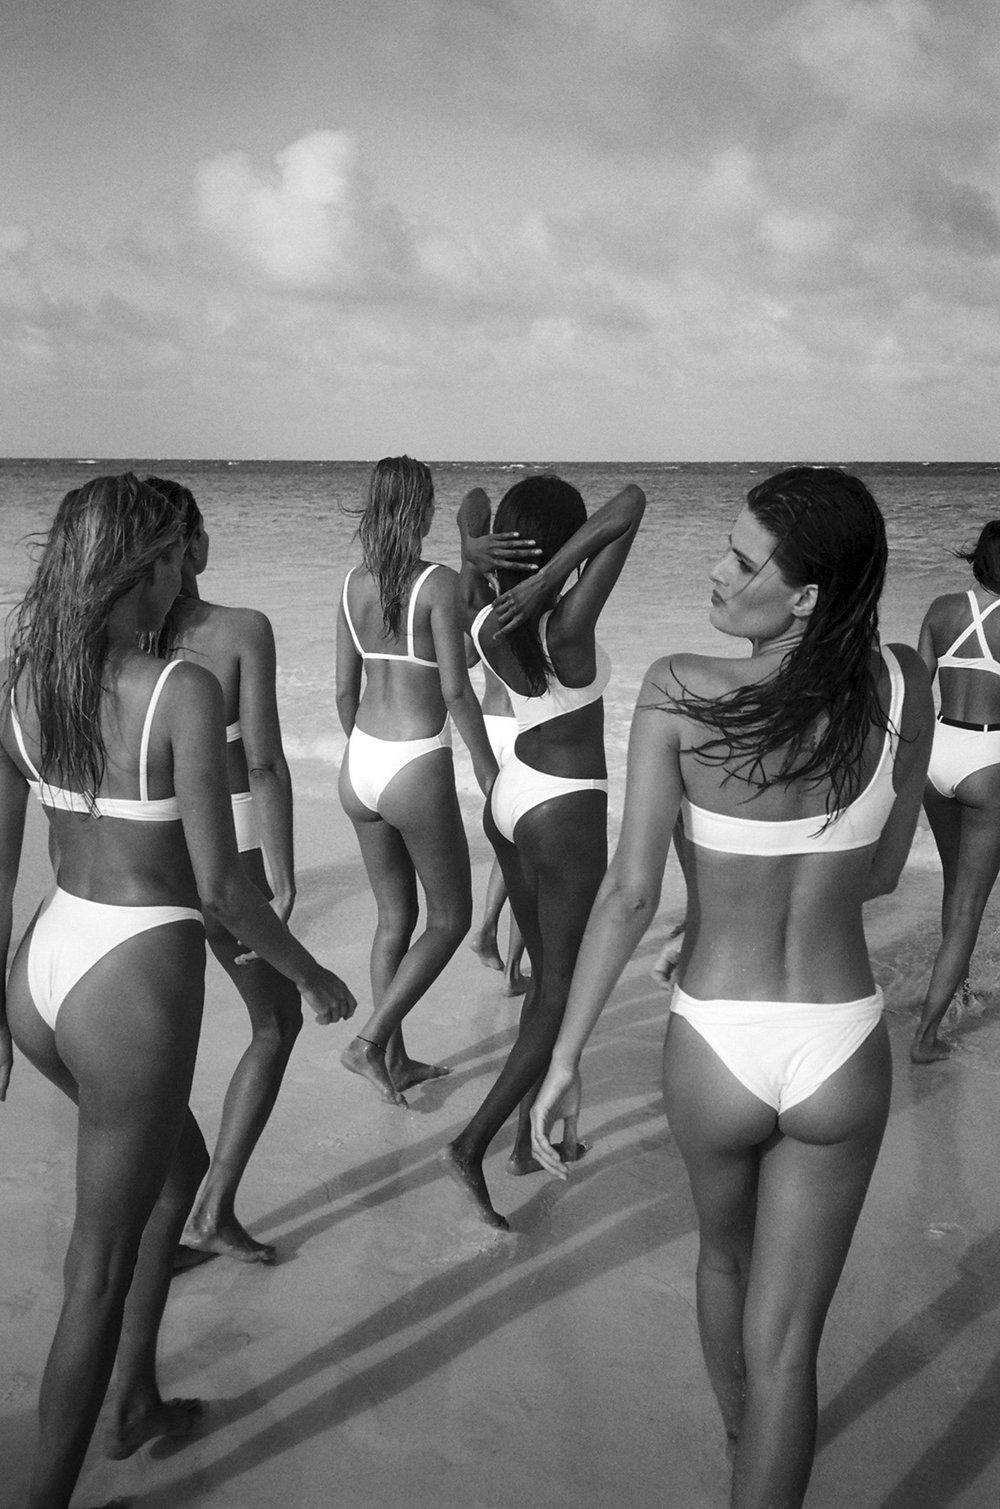 #solidandstriped #swimteam2018 #campaign #fashion #bjorniooss #pierrot #carineroitfeld #akkishirakawa #fulviafarolfi #lilyaldridge #haileyclauson #jourdandunn #hannahferguson #isabelifontana #tonigarrn #jessicahart #elsahosk #enikomihalik #carolynmurphy #barbarapalvin #natashapoly #josephineskriver #jimkaemmerling